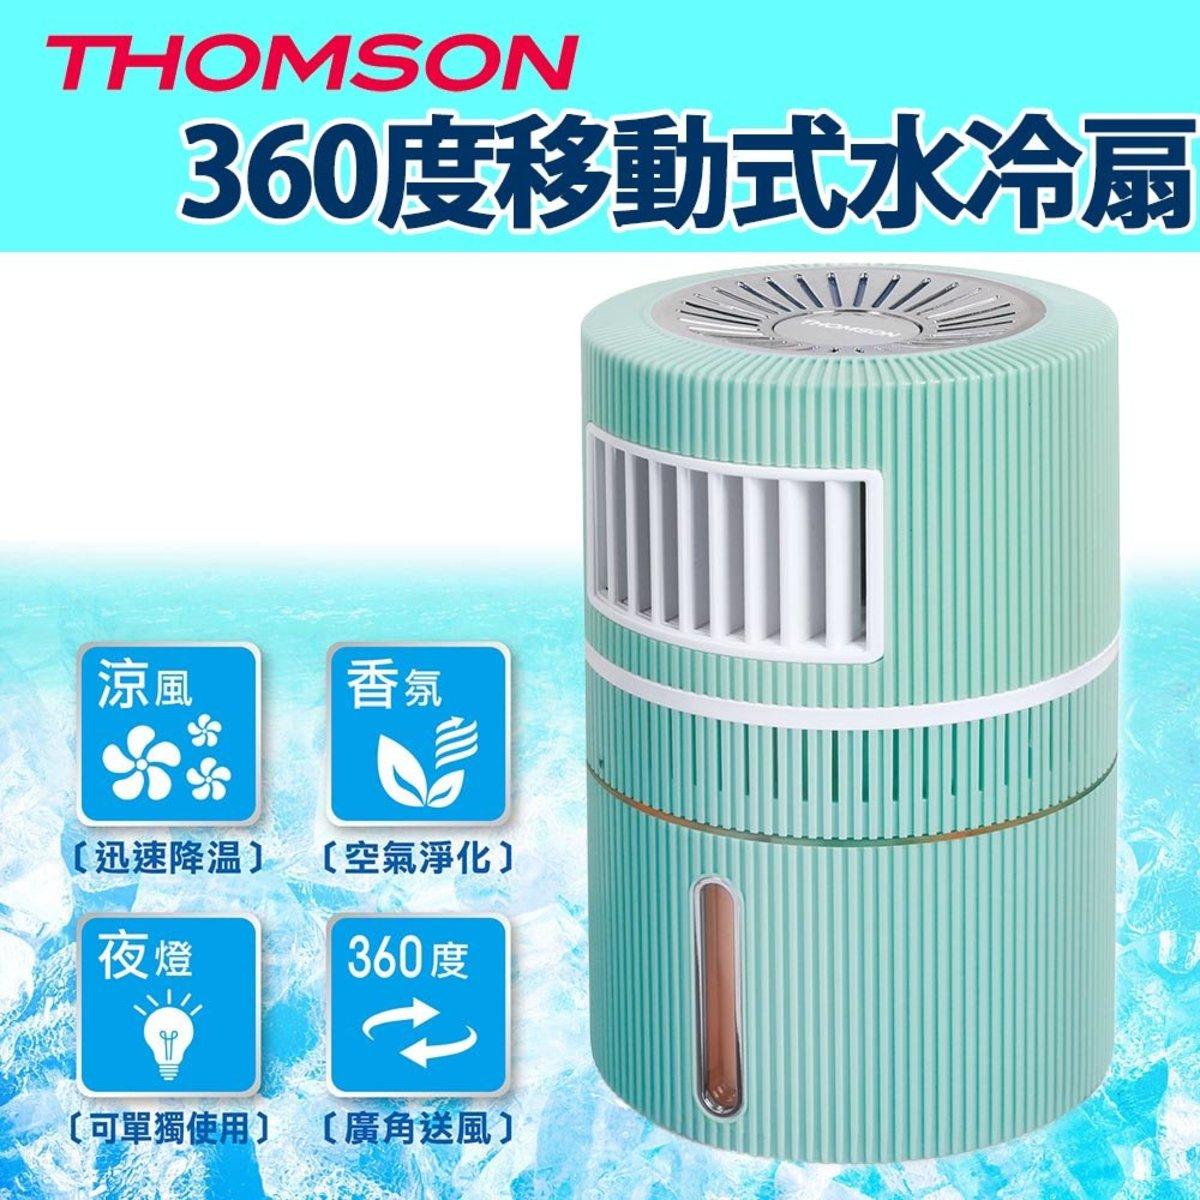 360 degree Cooling Machine (Green) TM-SAF17U